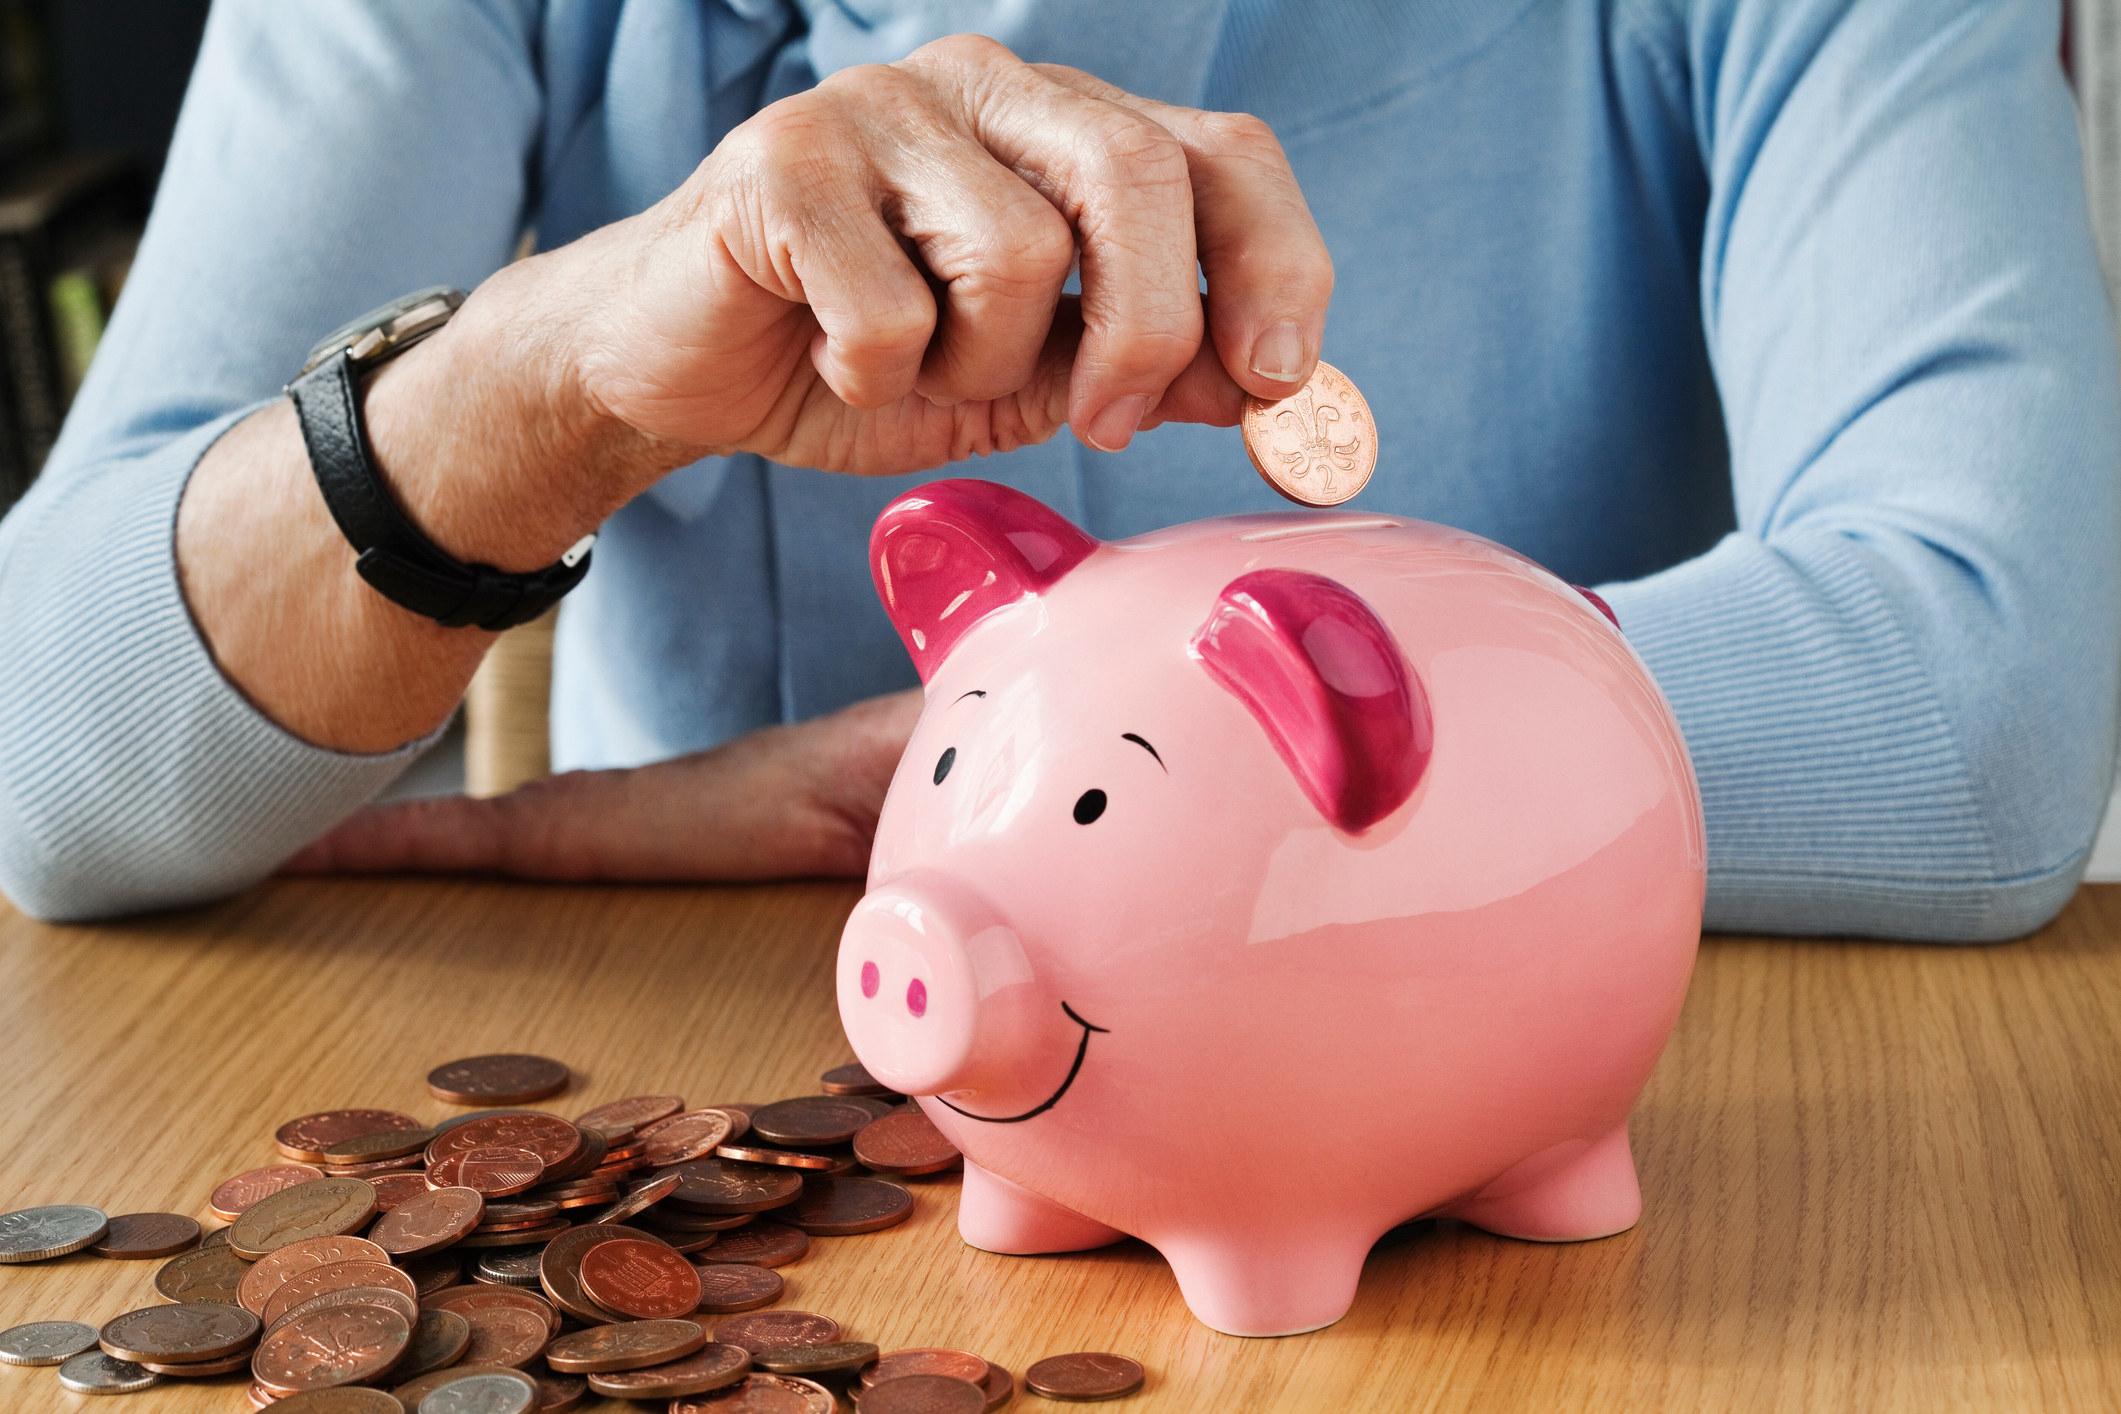 Person putting money into a piggy bank